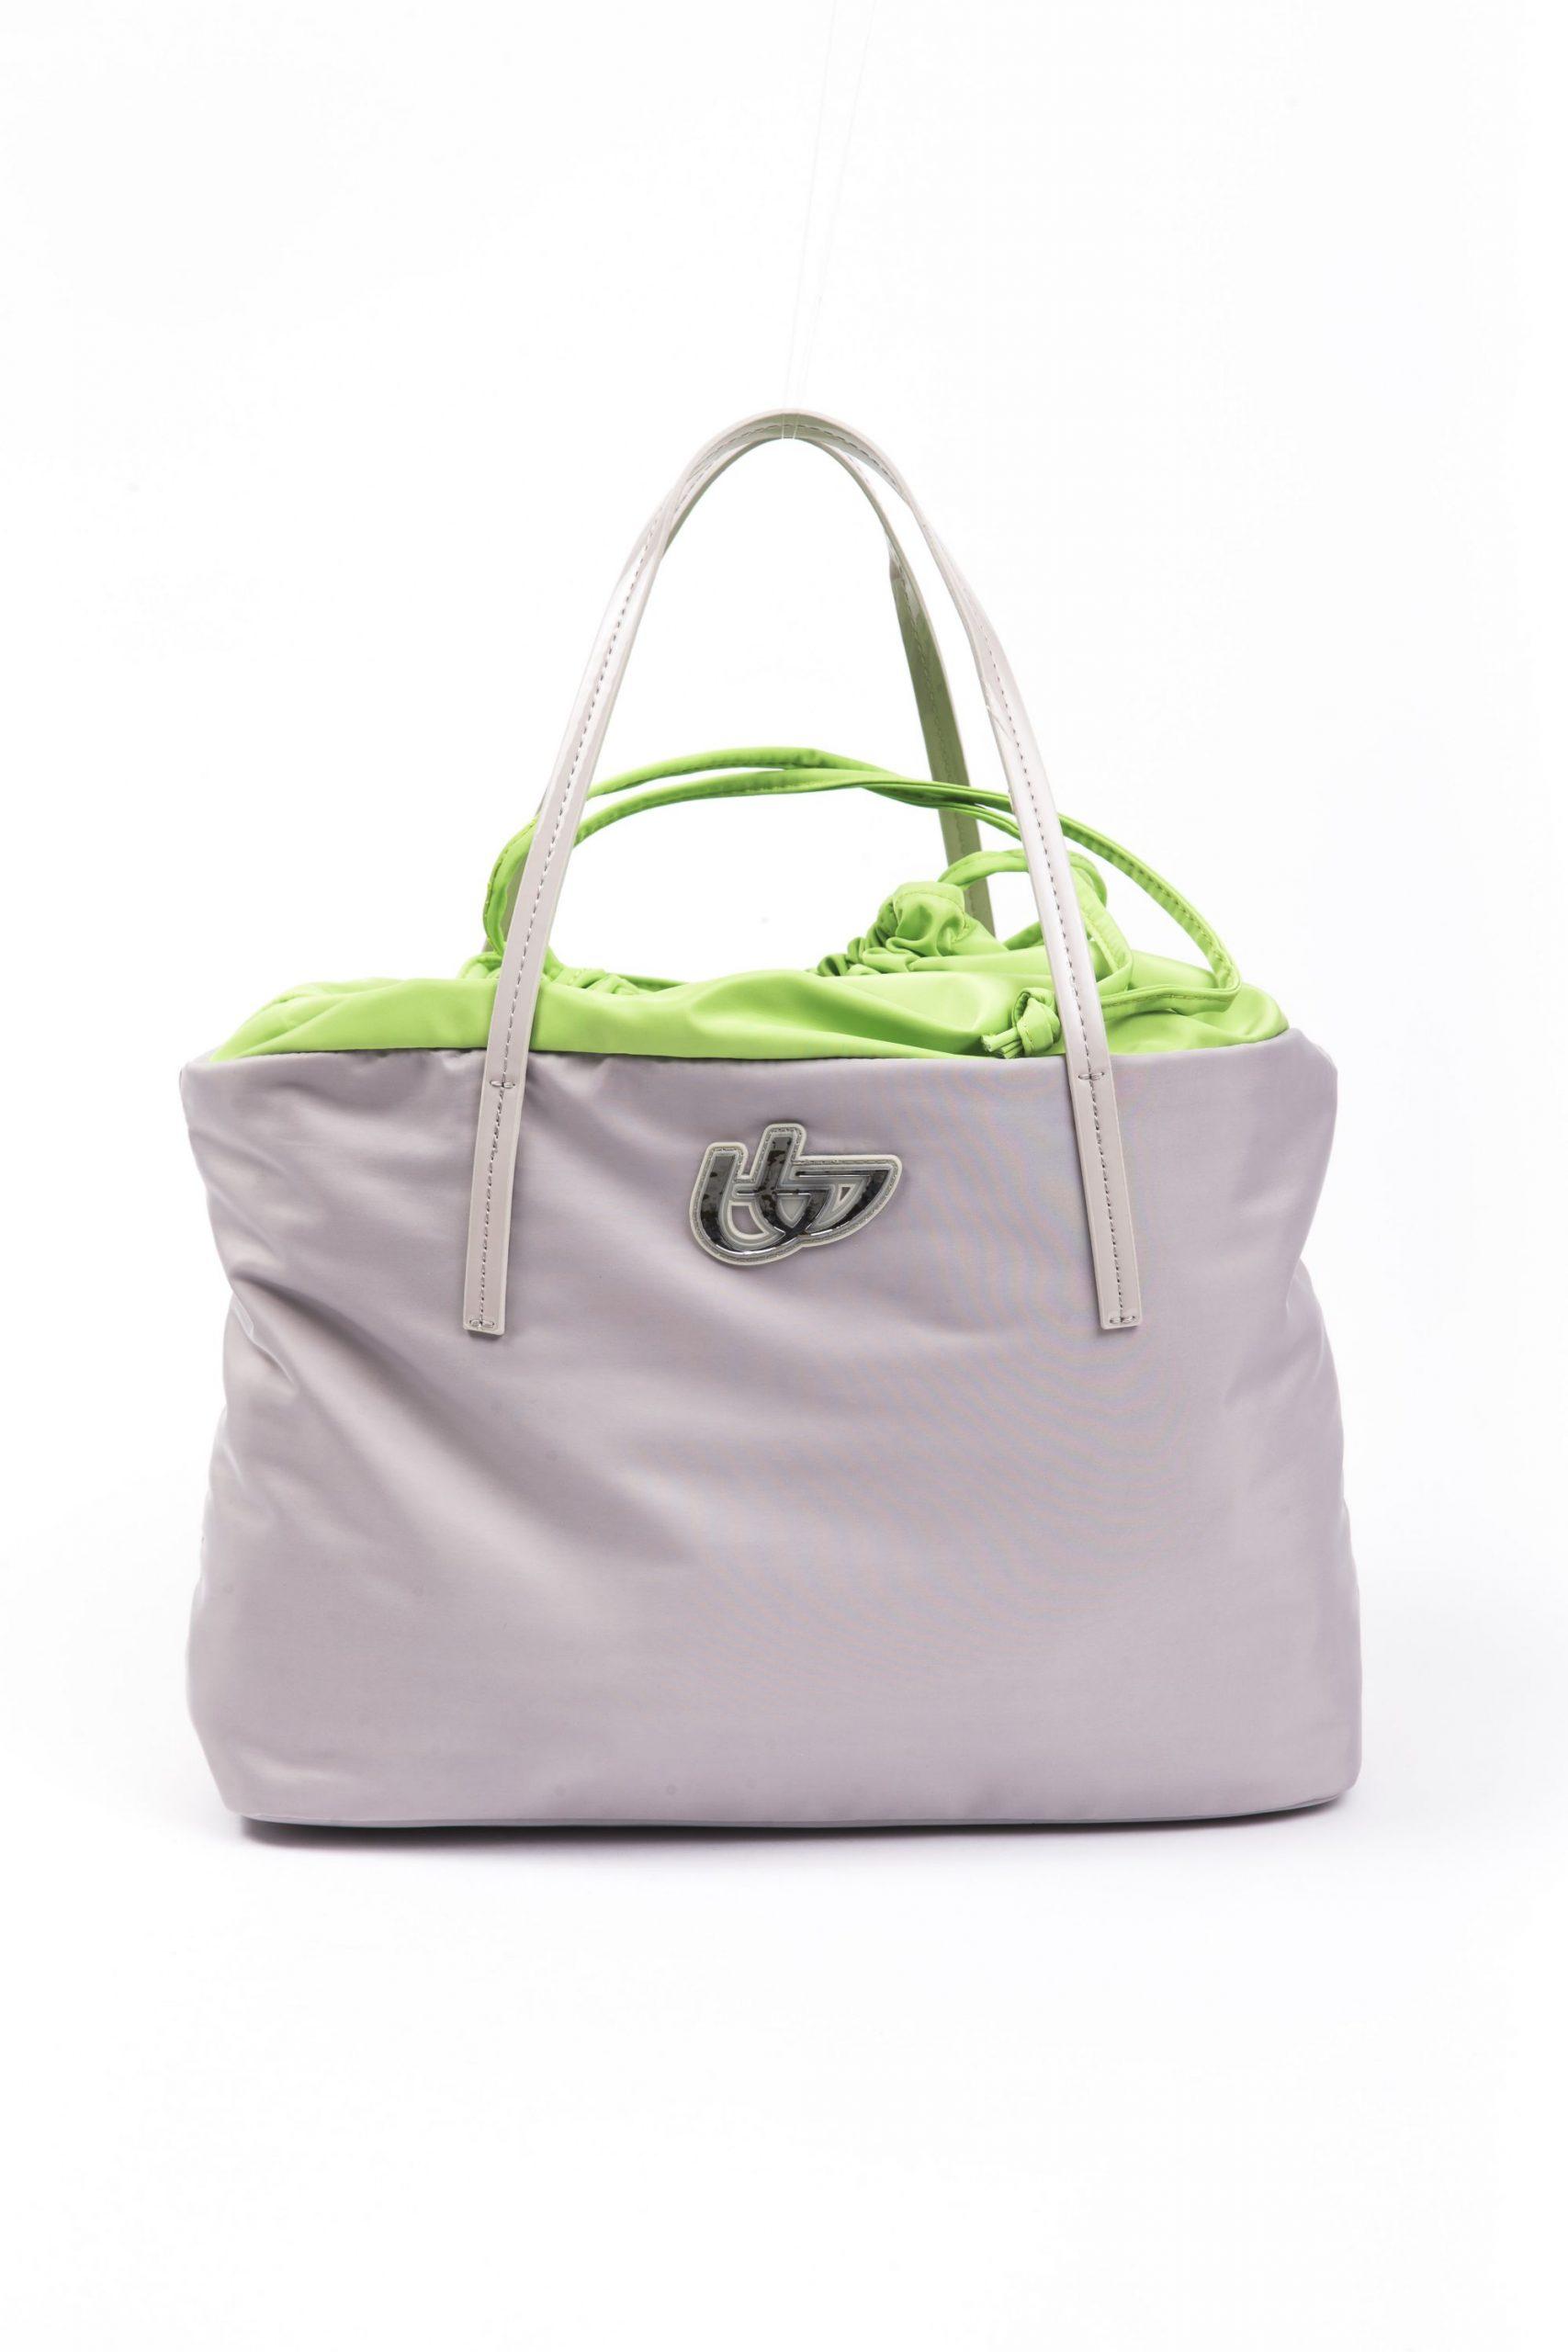 Byblos Women's Shopping Bag Grey BY665675